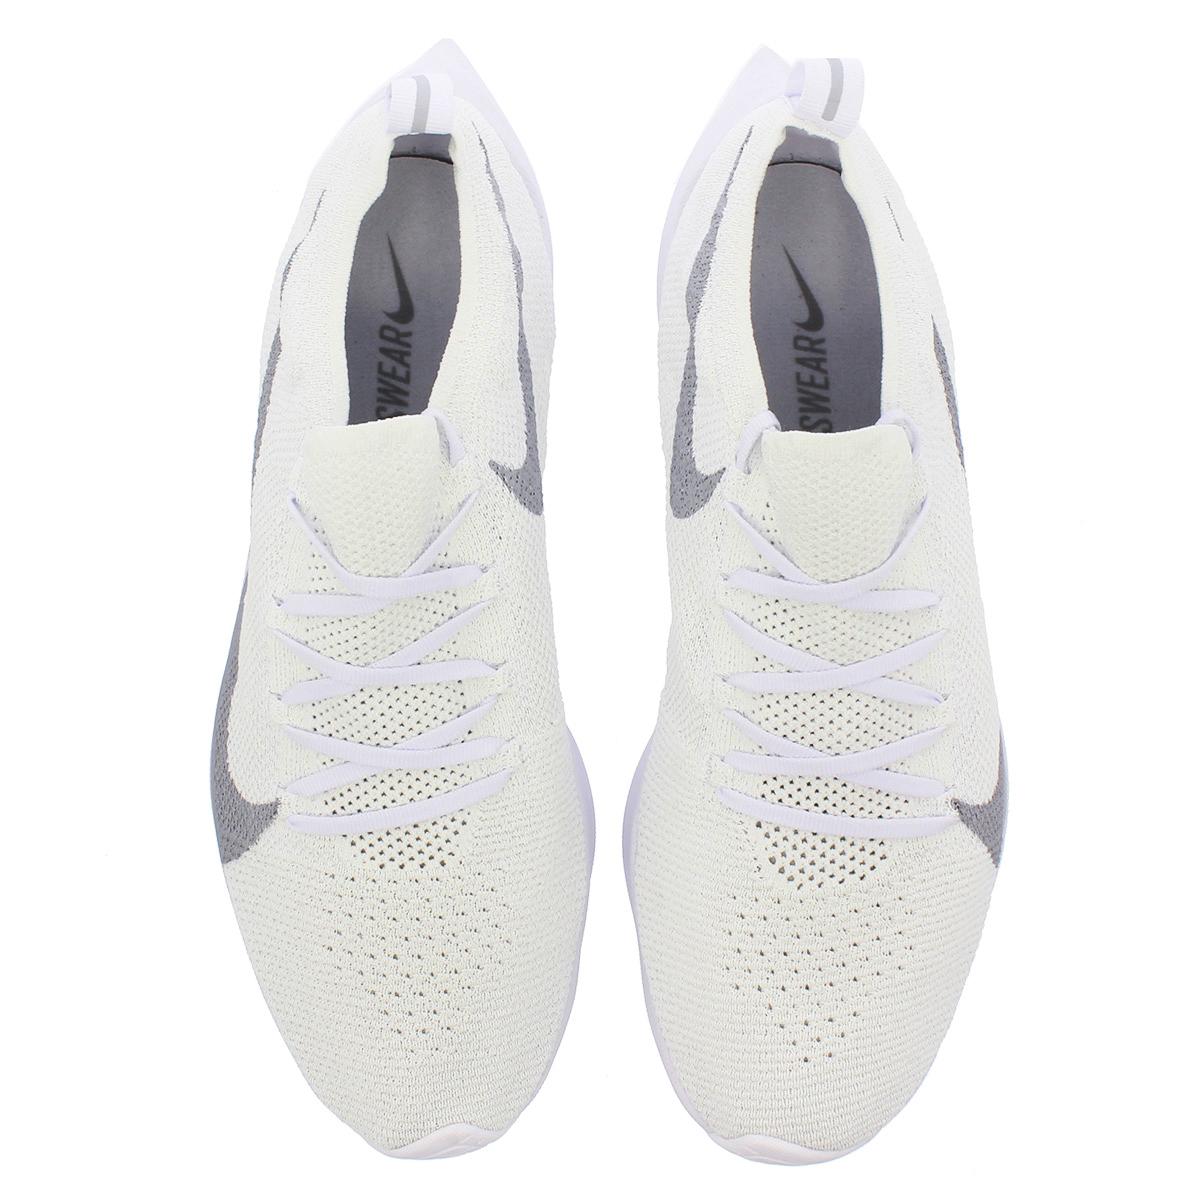 84562e01be8f68 NIKE VAPOR STREET FLYKNIT Nike vapor street fried food knit WHITE WOLF GREY  VIETNAM aq1763-100